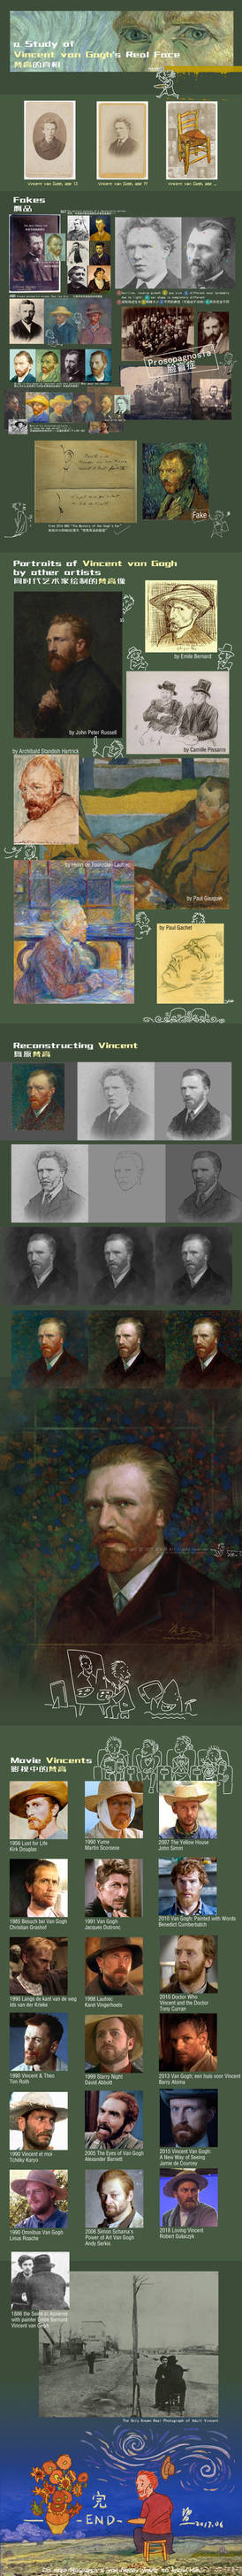 Vincent van Gogh real face study